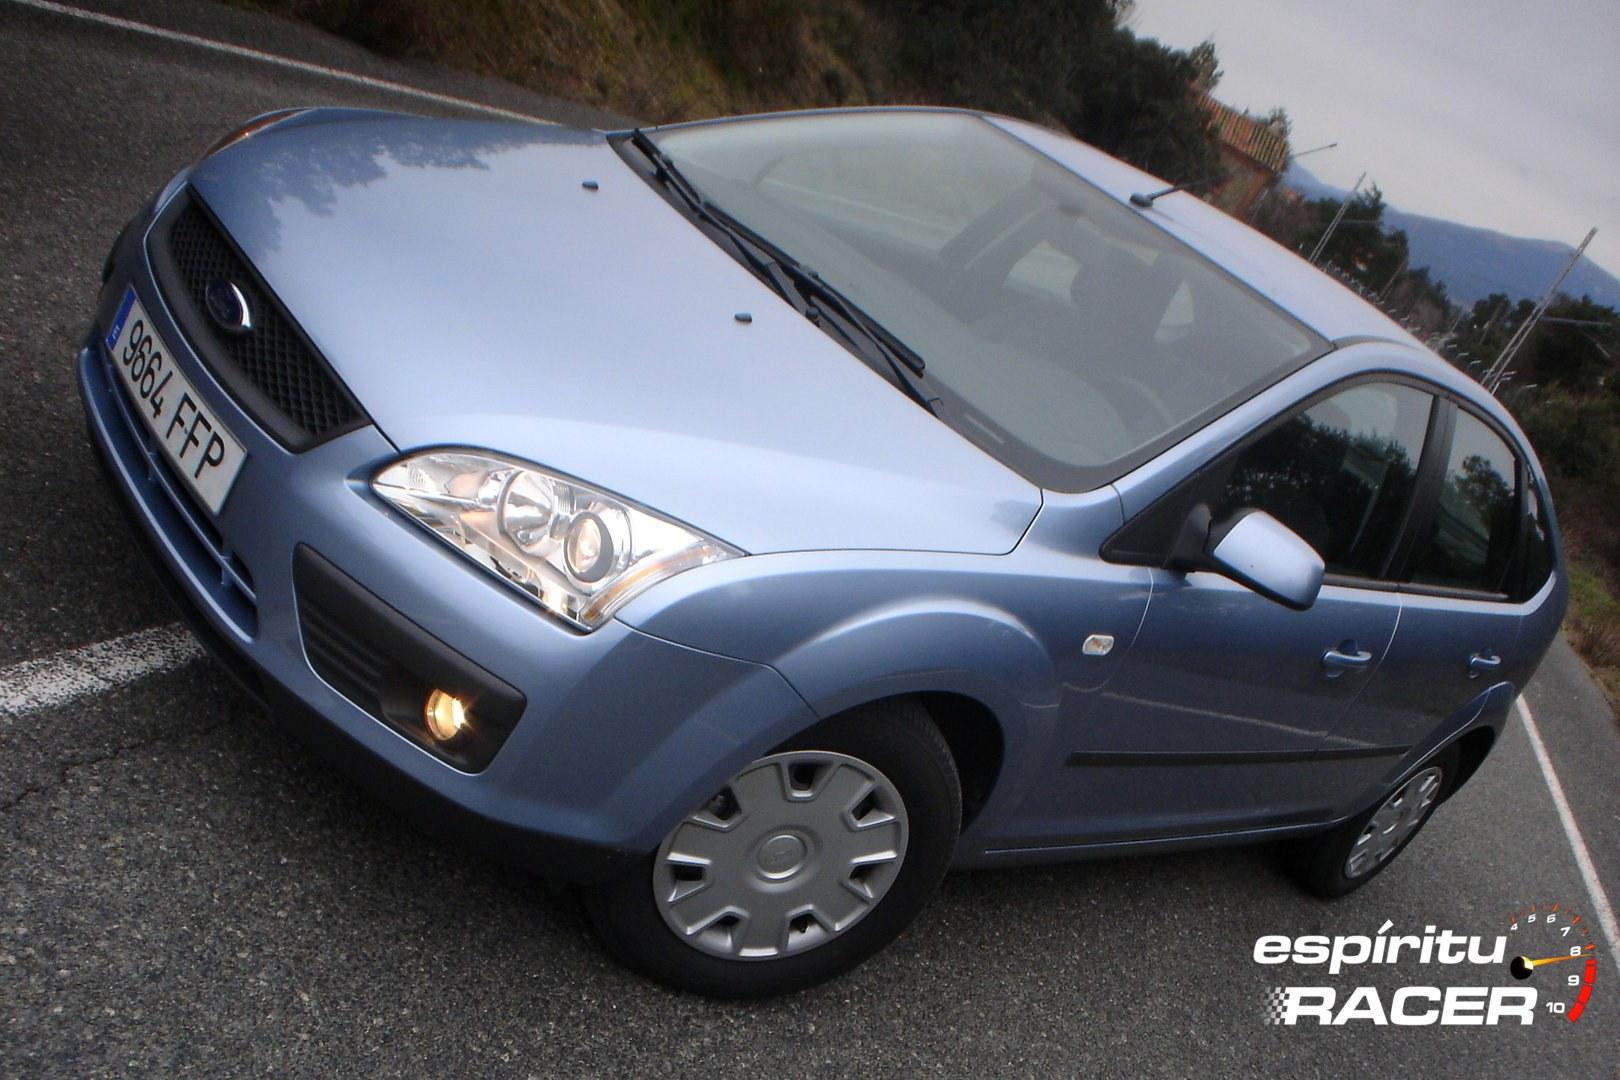 Ford Focus TDCi 90 Mk2 3